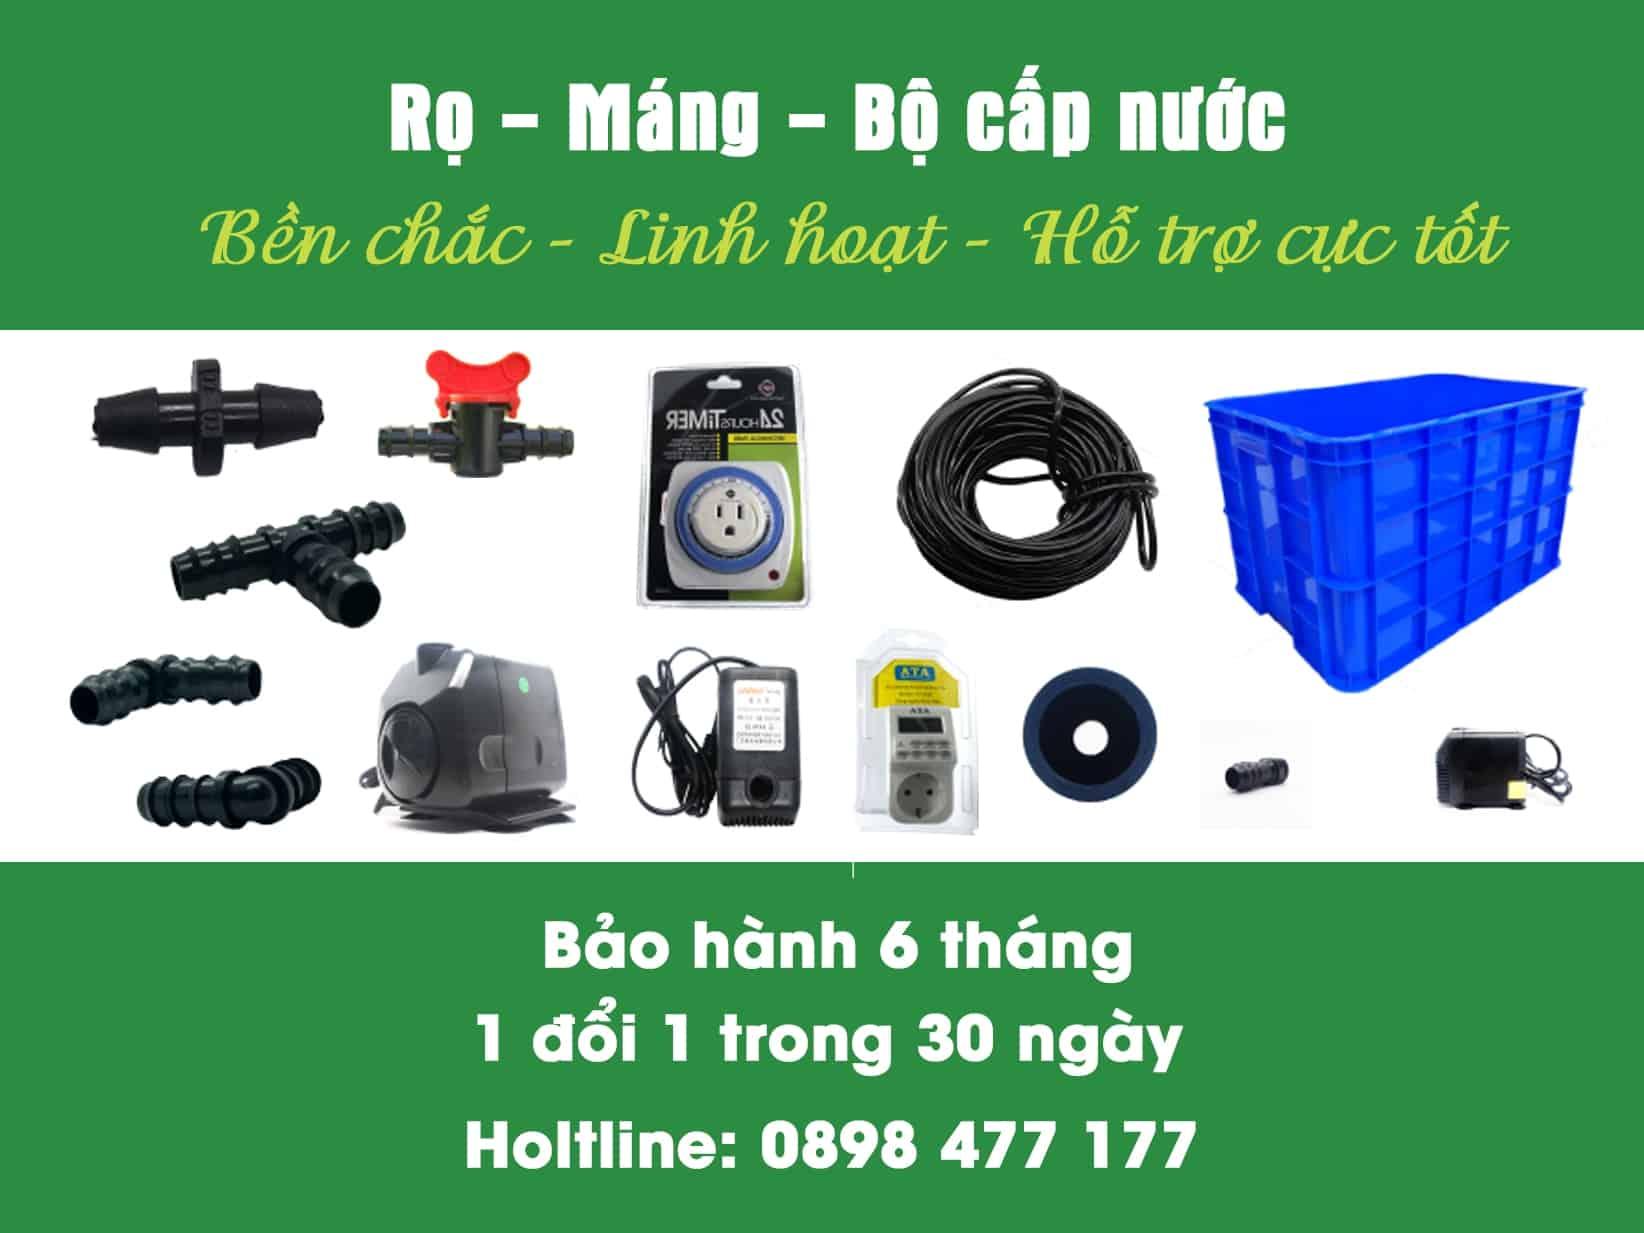 ro-mang-bo-cap-nuoc-thuy-canh-ben-chac-linh-hoat